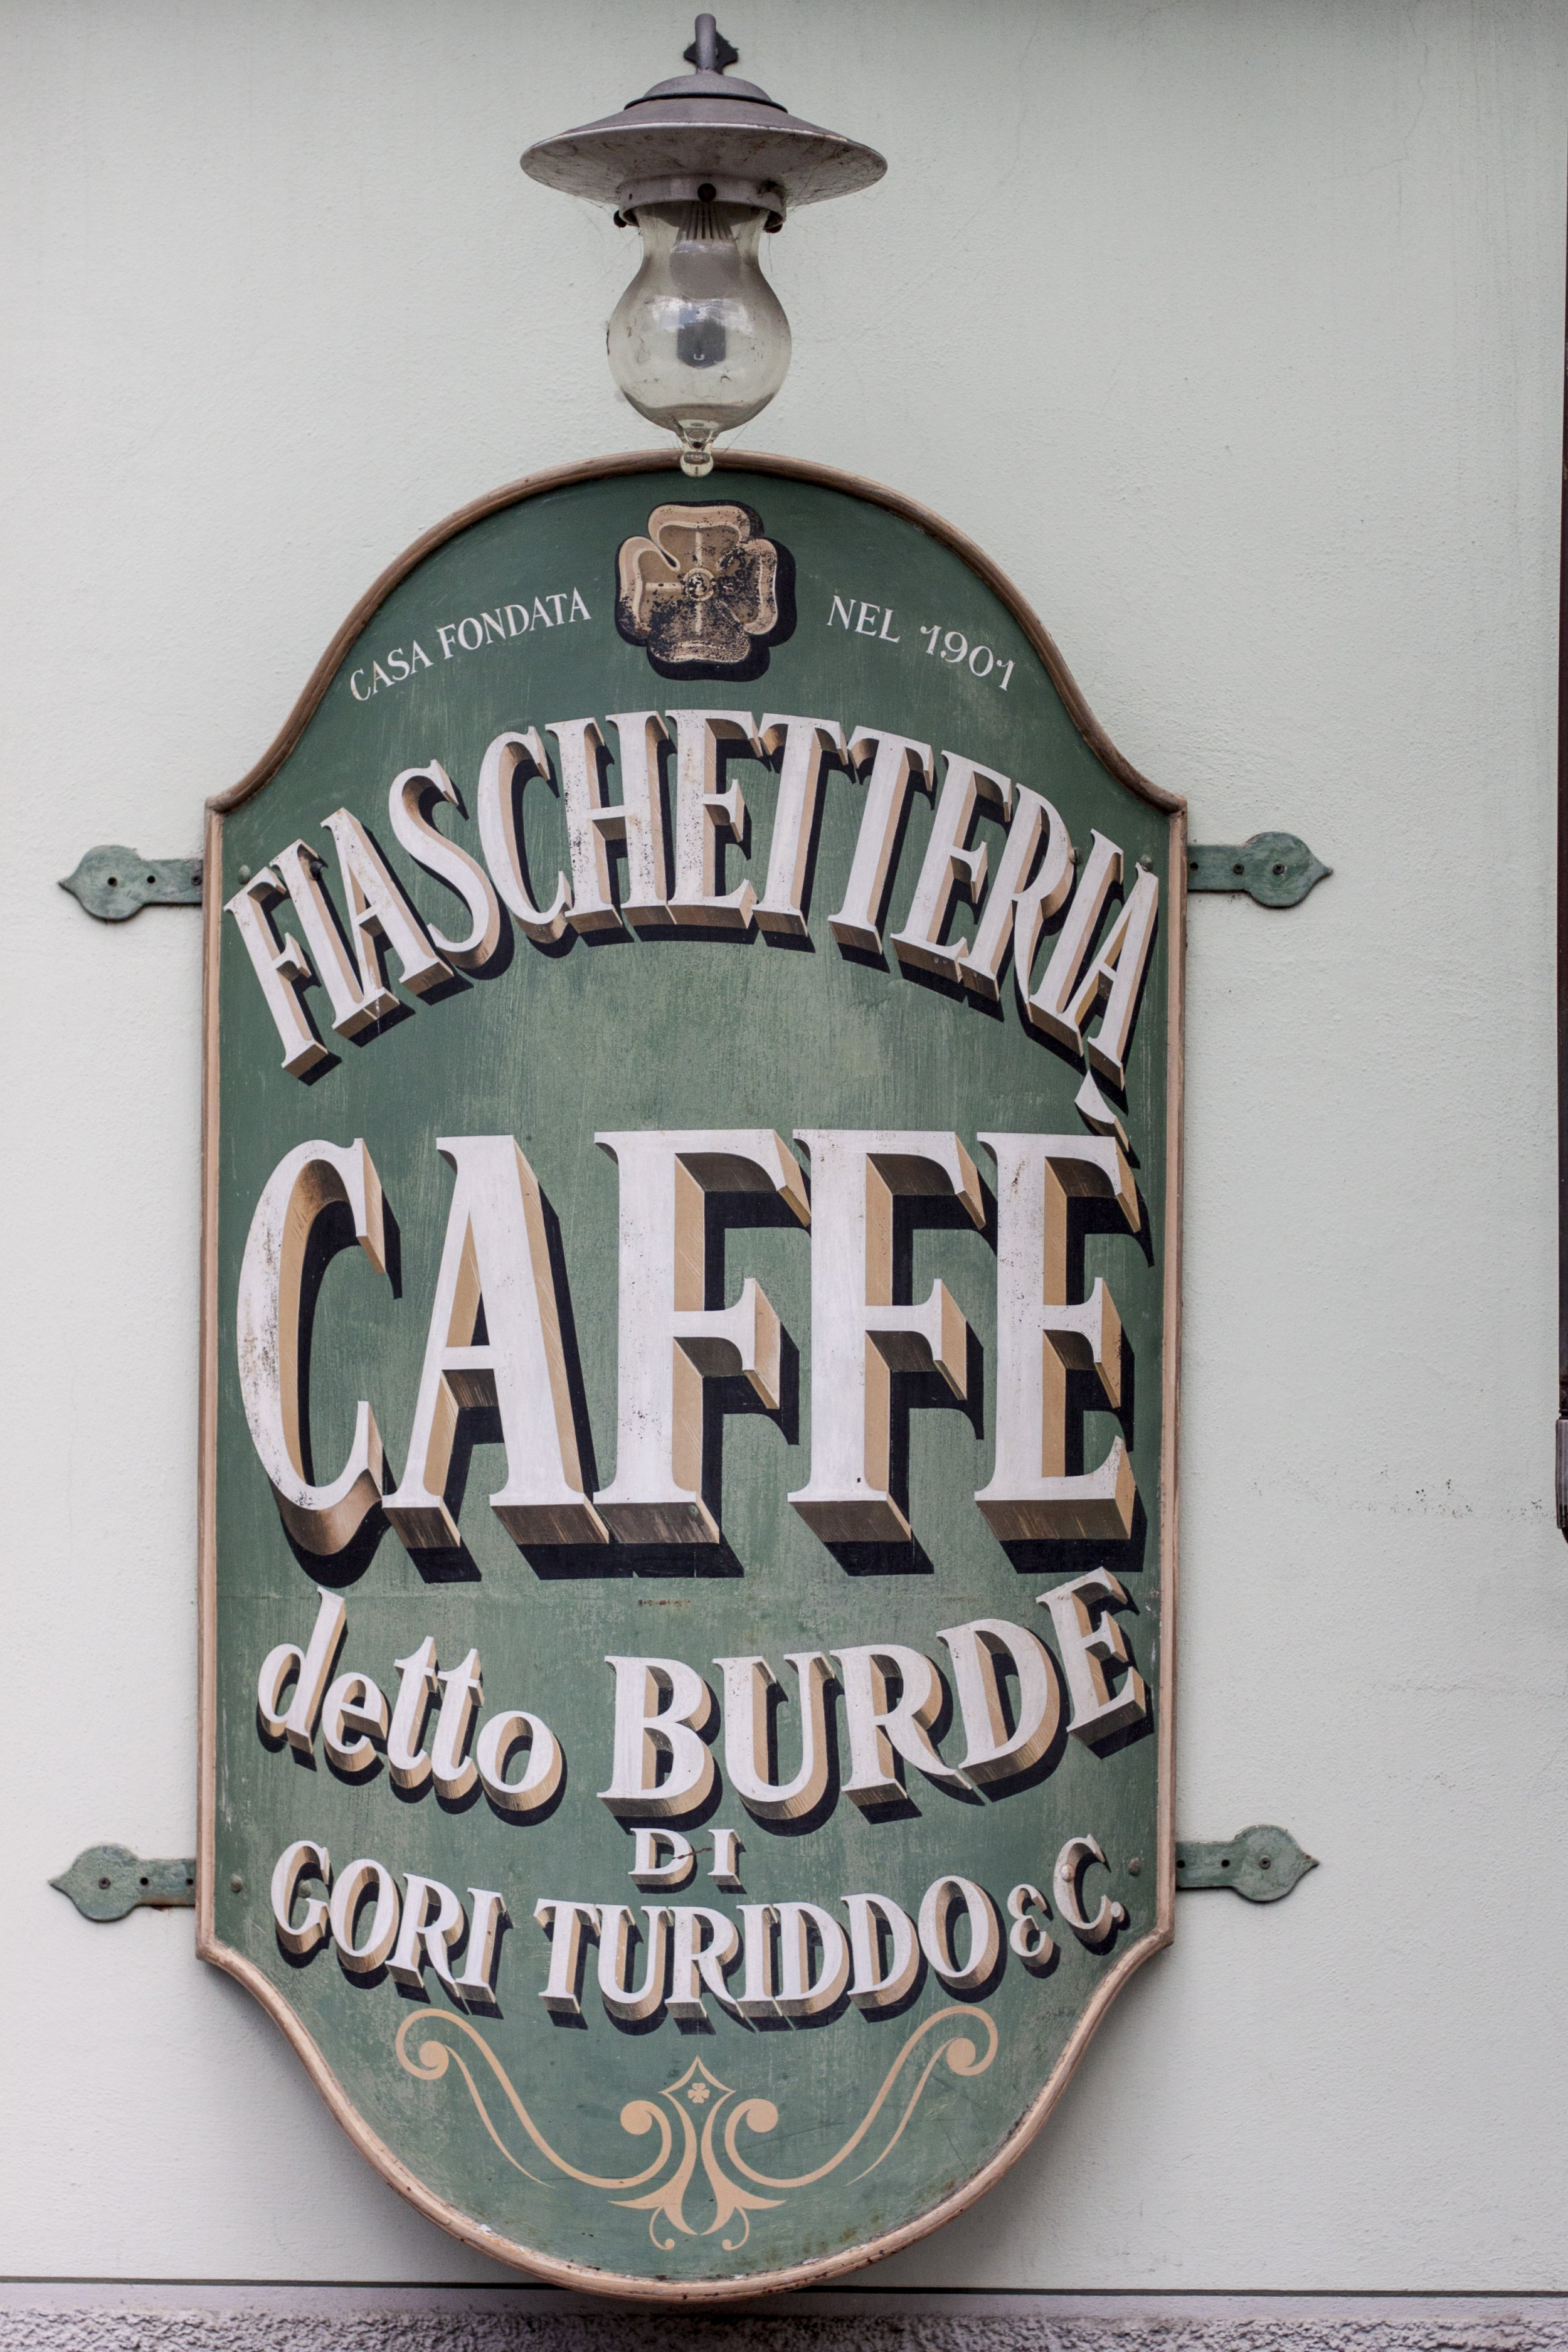 Caffe de Burde photo credit Emiko Davies